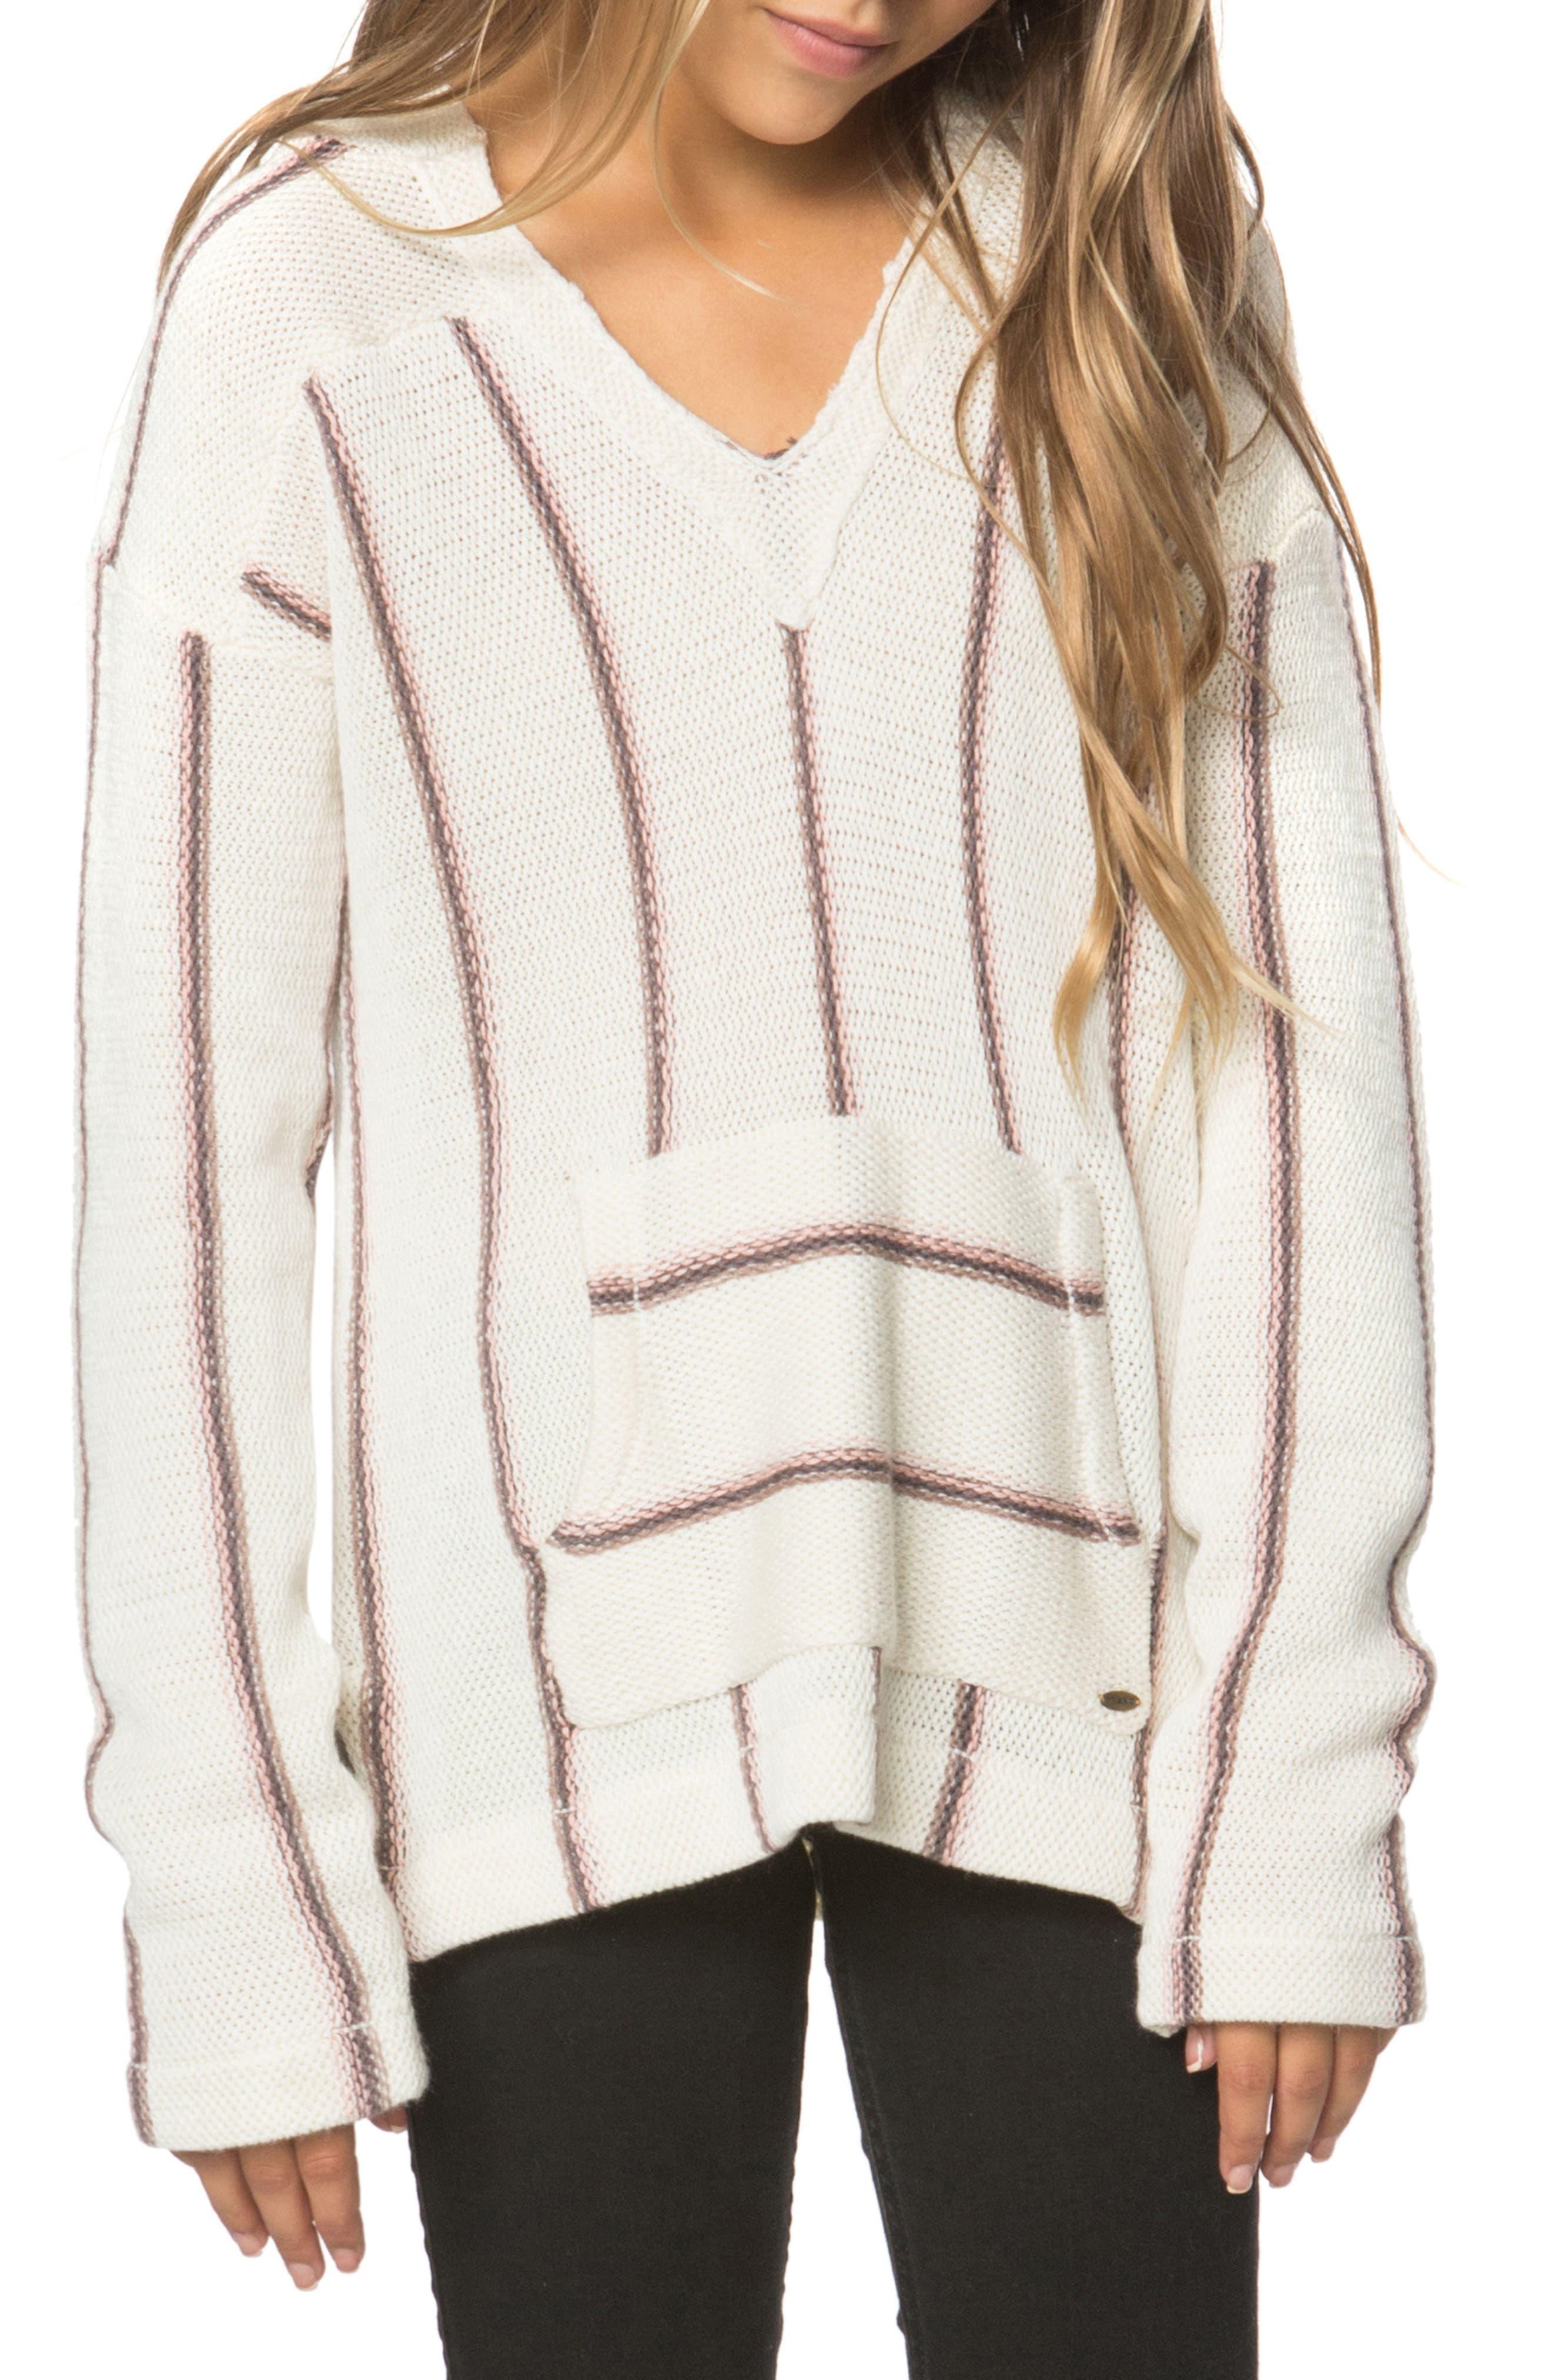 Ashlynn Hooded Sweater,                             Main thumbnail 1, color,                             900